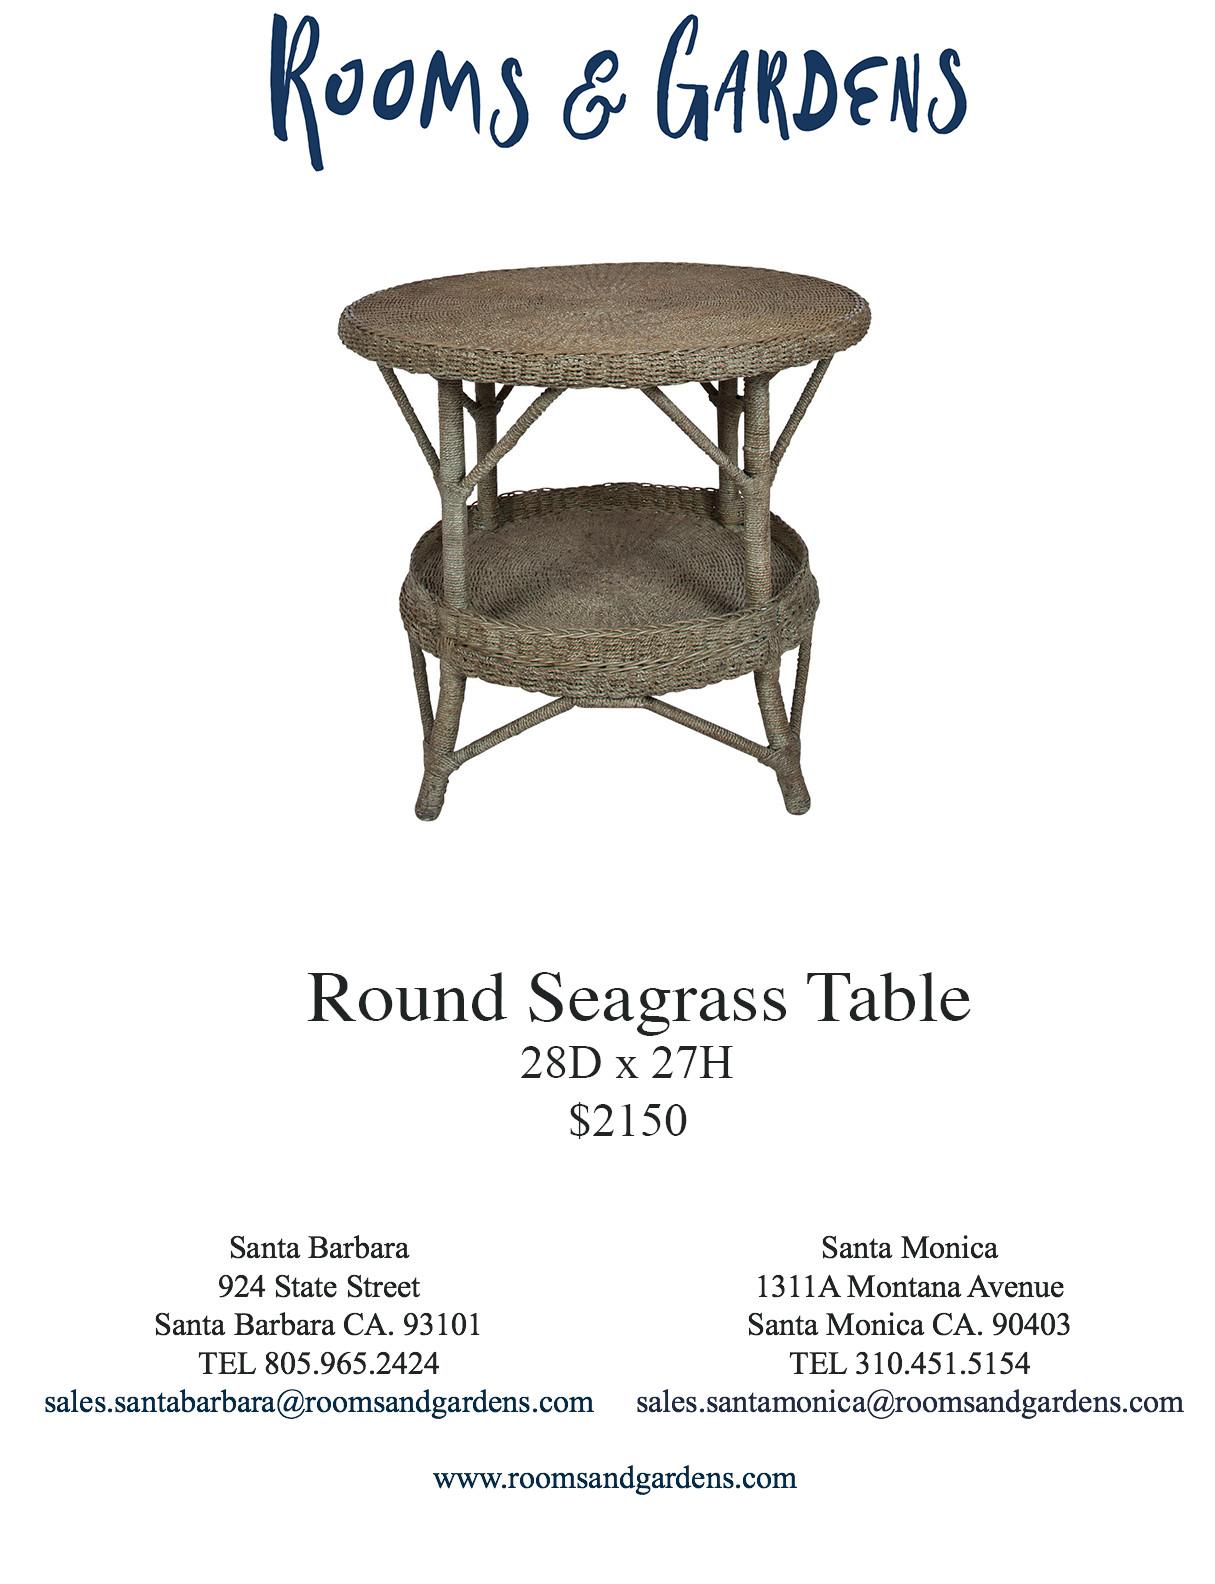 Custom Seagrass & Wicker — Rooms & Gardens